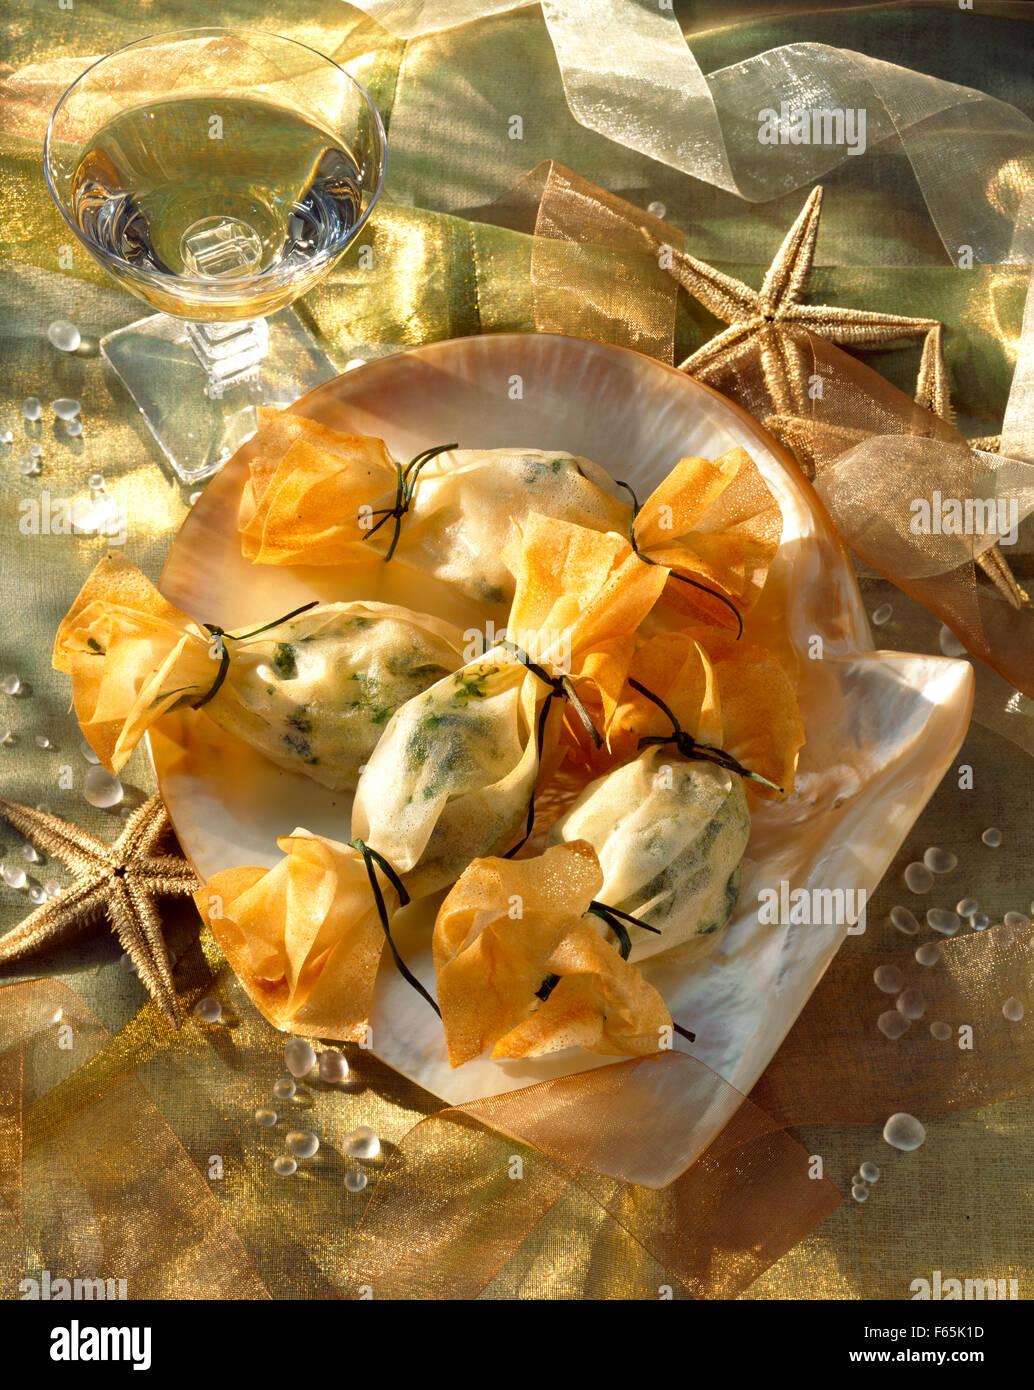 Jakobsmuscheln in Blätterteig gehüllt Stockfoto